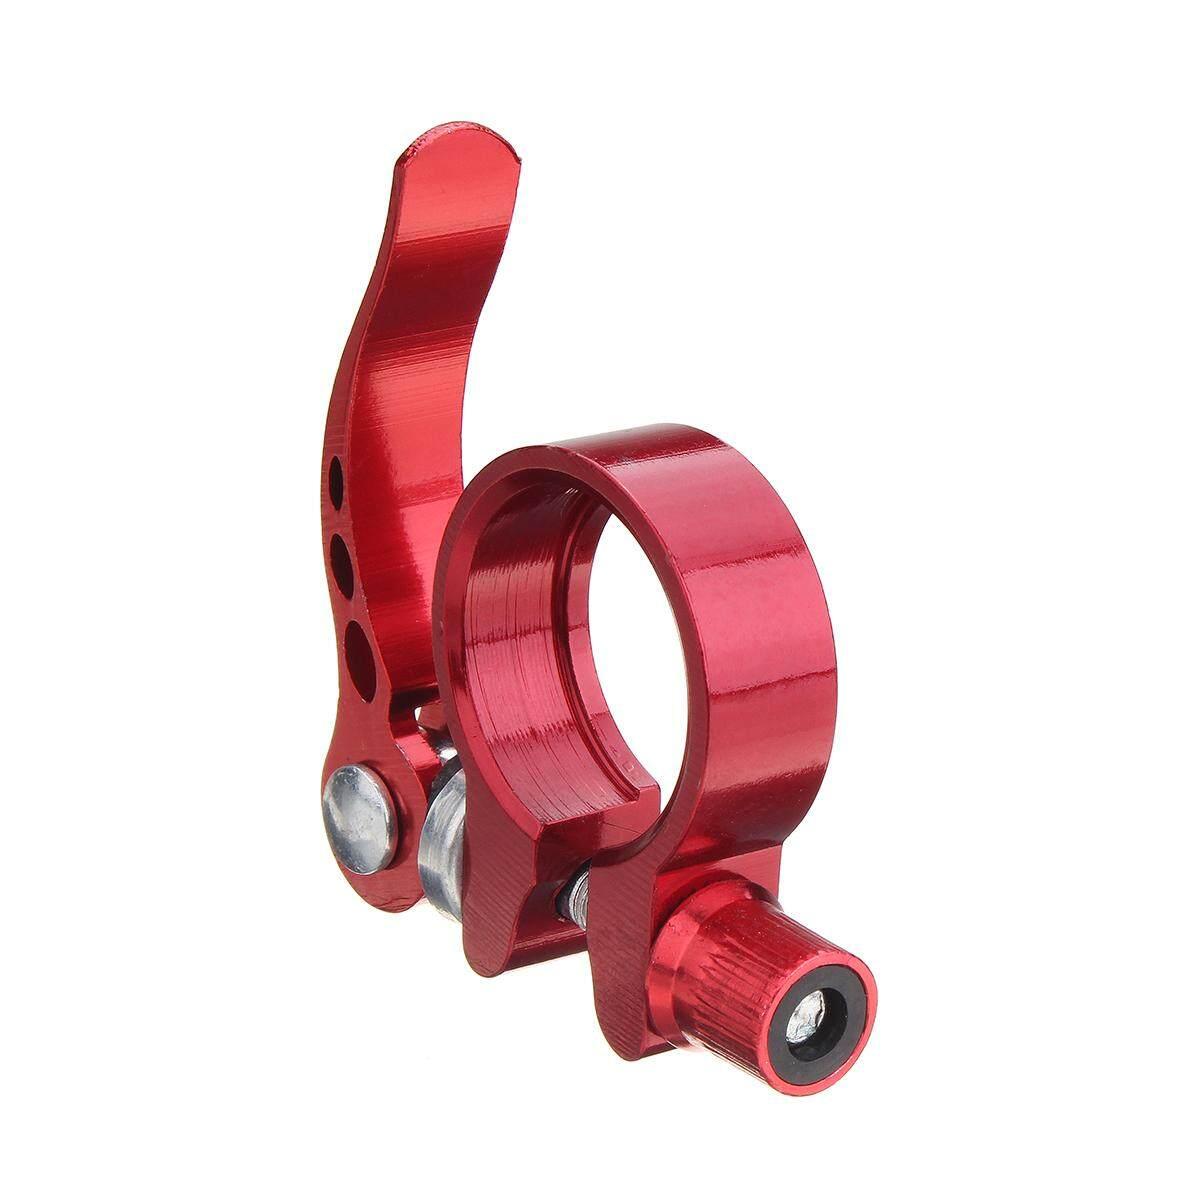 Detail Gambar Sepeda Pelepas Sepeda Cepat Dudukan Sepeda Tempat Duduk Clamp Alumunium Alloy 3 Ukuran Merah